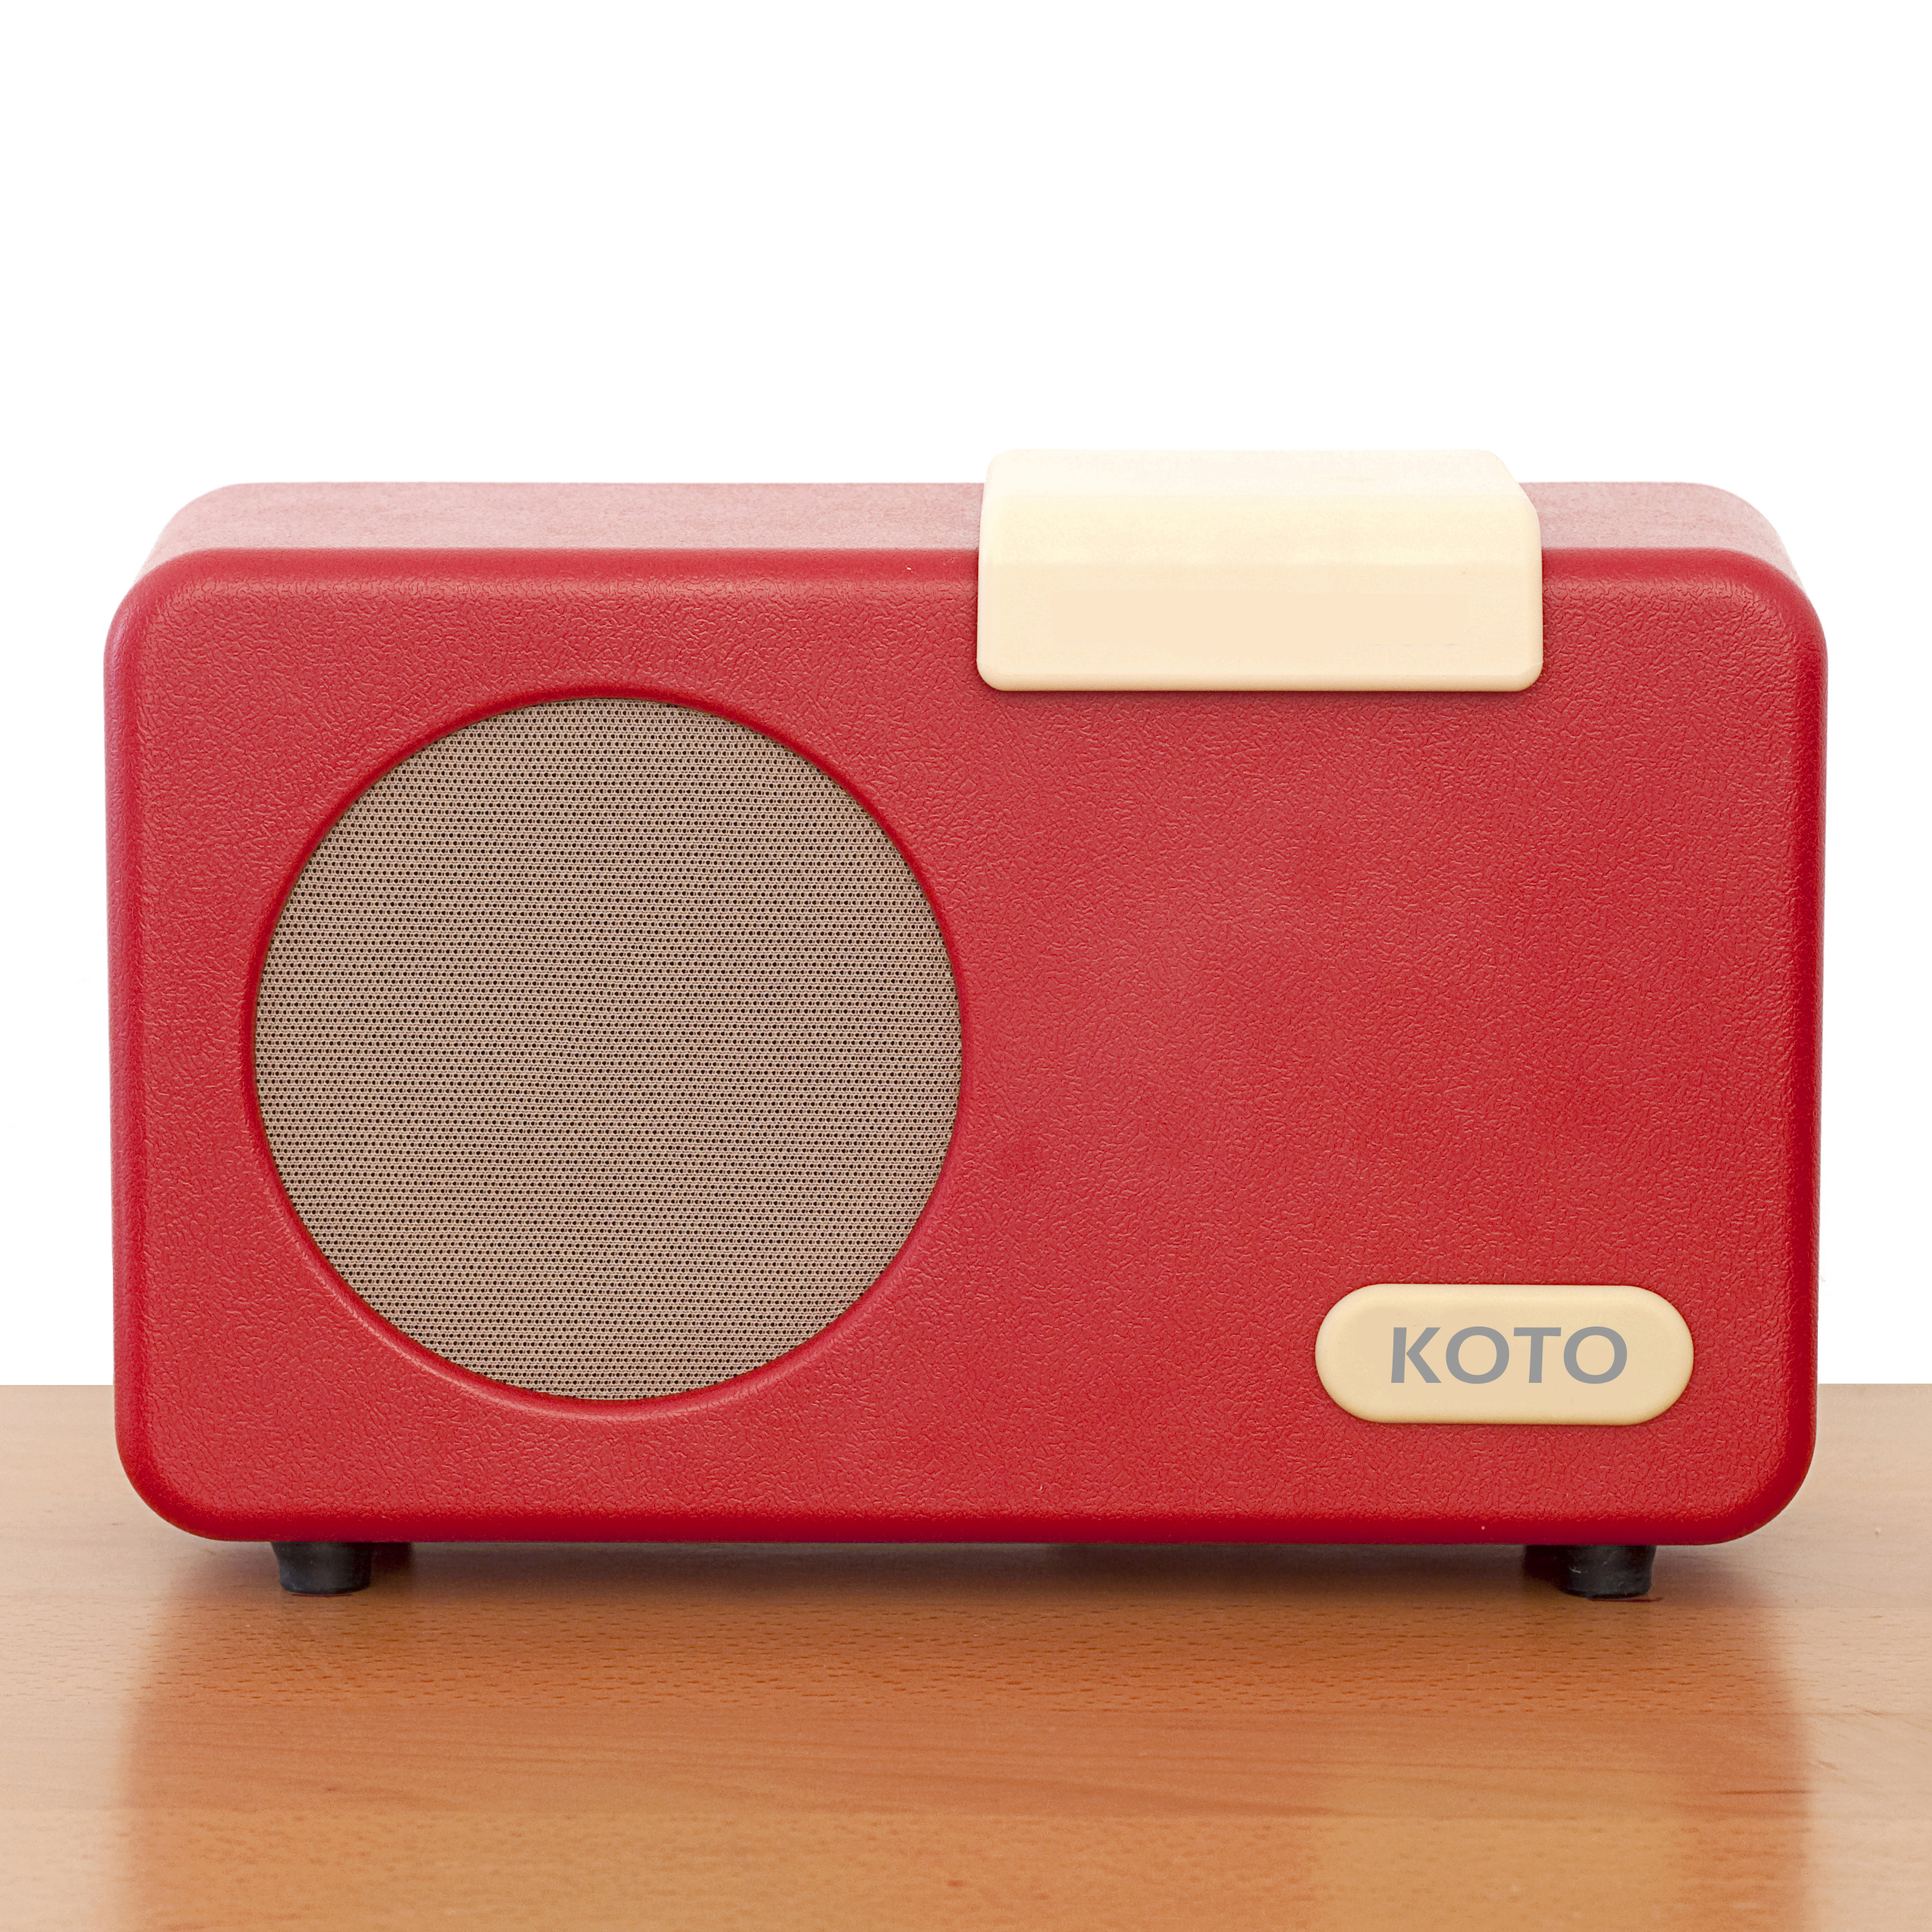 OER Music player Radio Rood - Radio voor dementerende